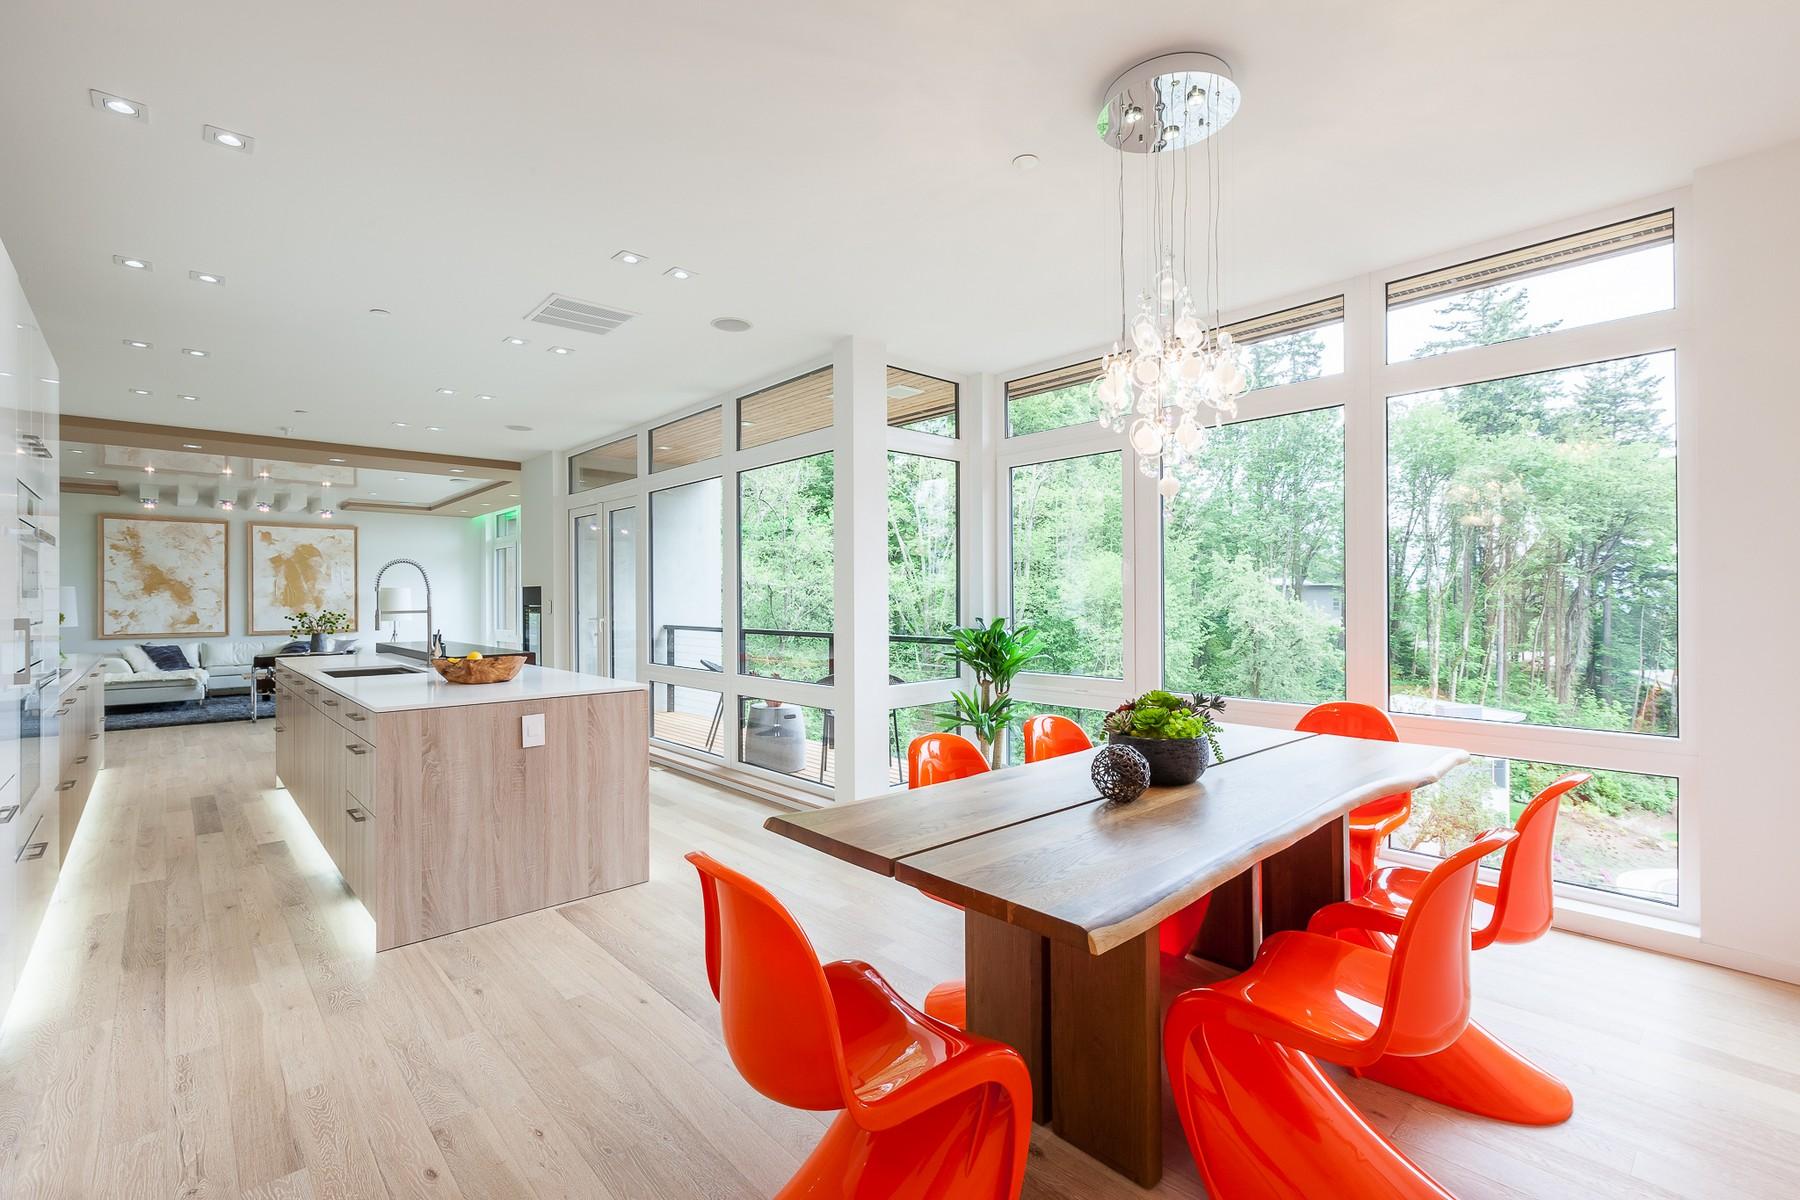 Single Family Home for Sale at Visually Distinct Modern 6520 NE 129th St Kirkland, Washington 98034 United States